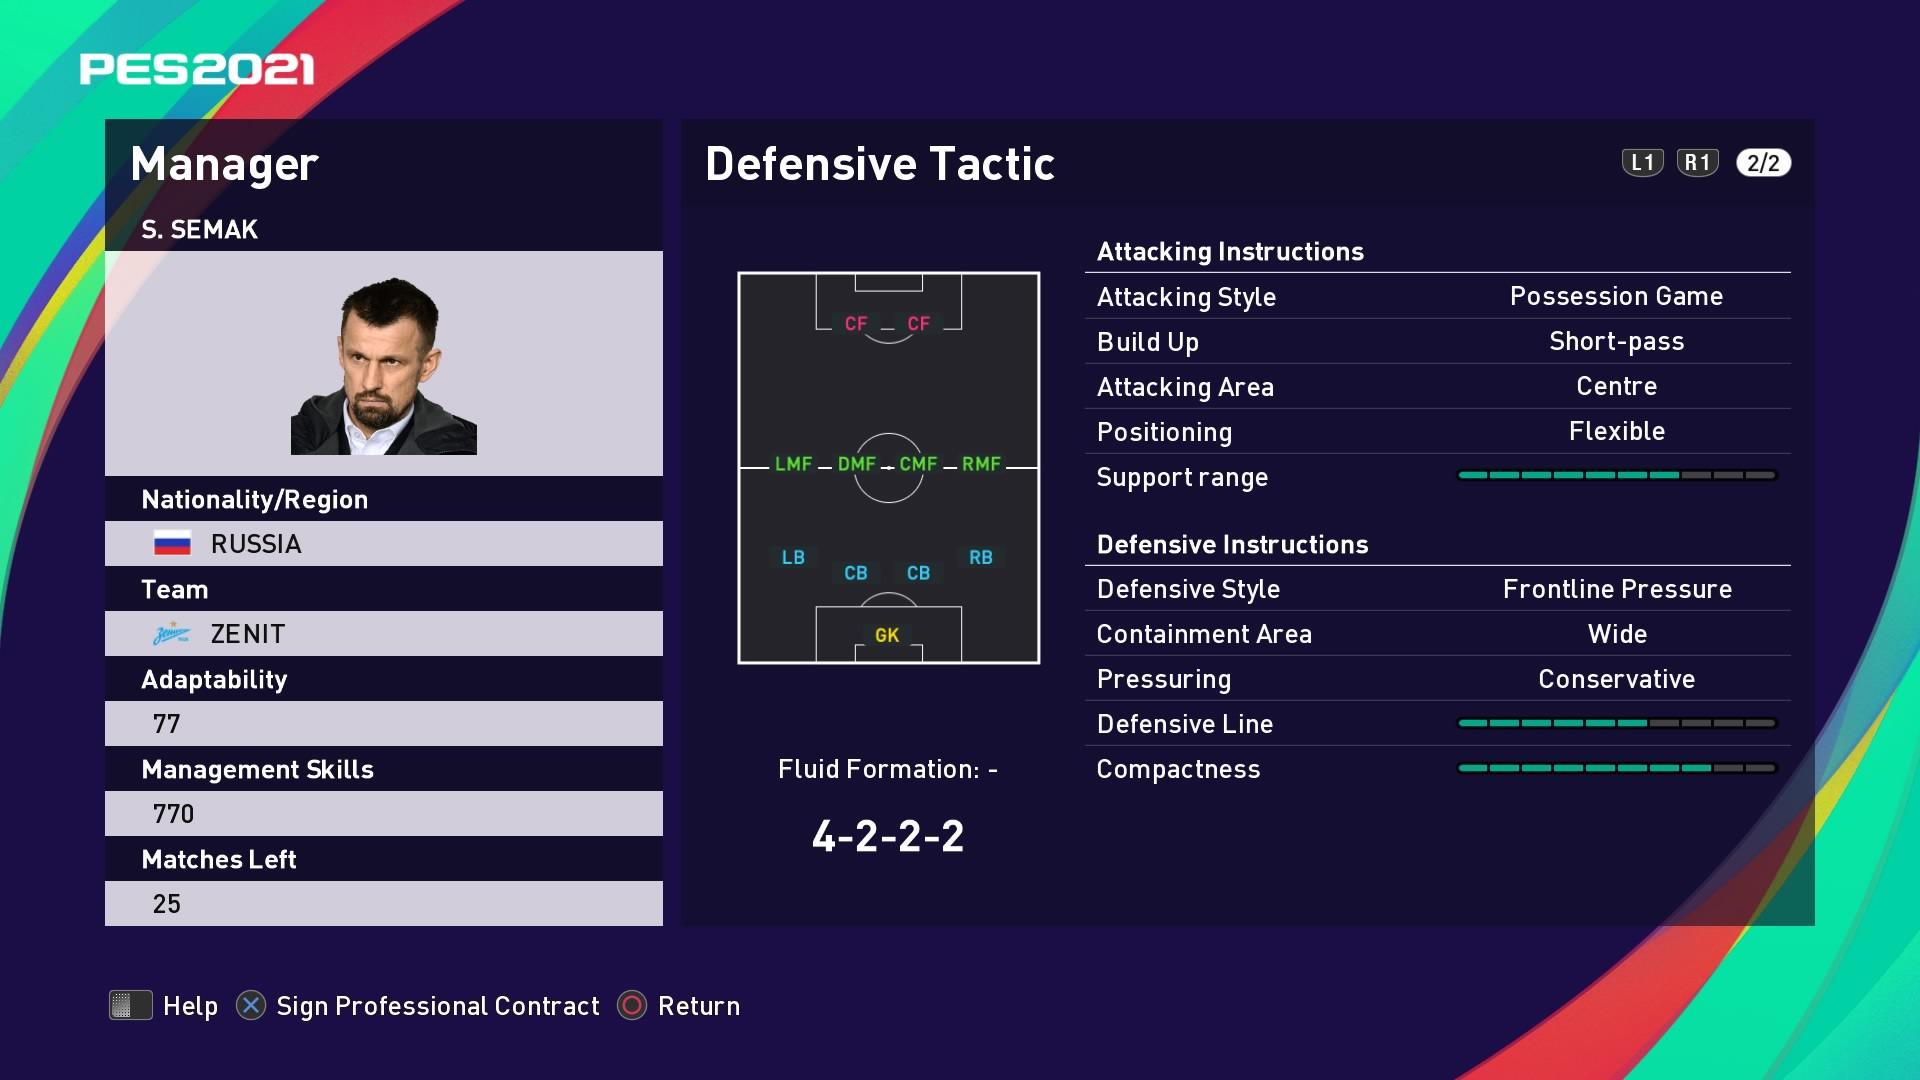 S. Semak (Sergei Semak) Defensive Tactic in PES 2021 myClub